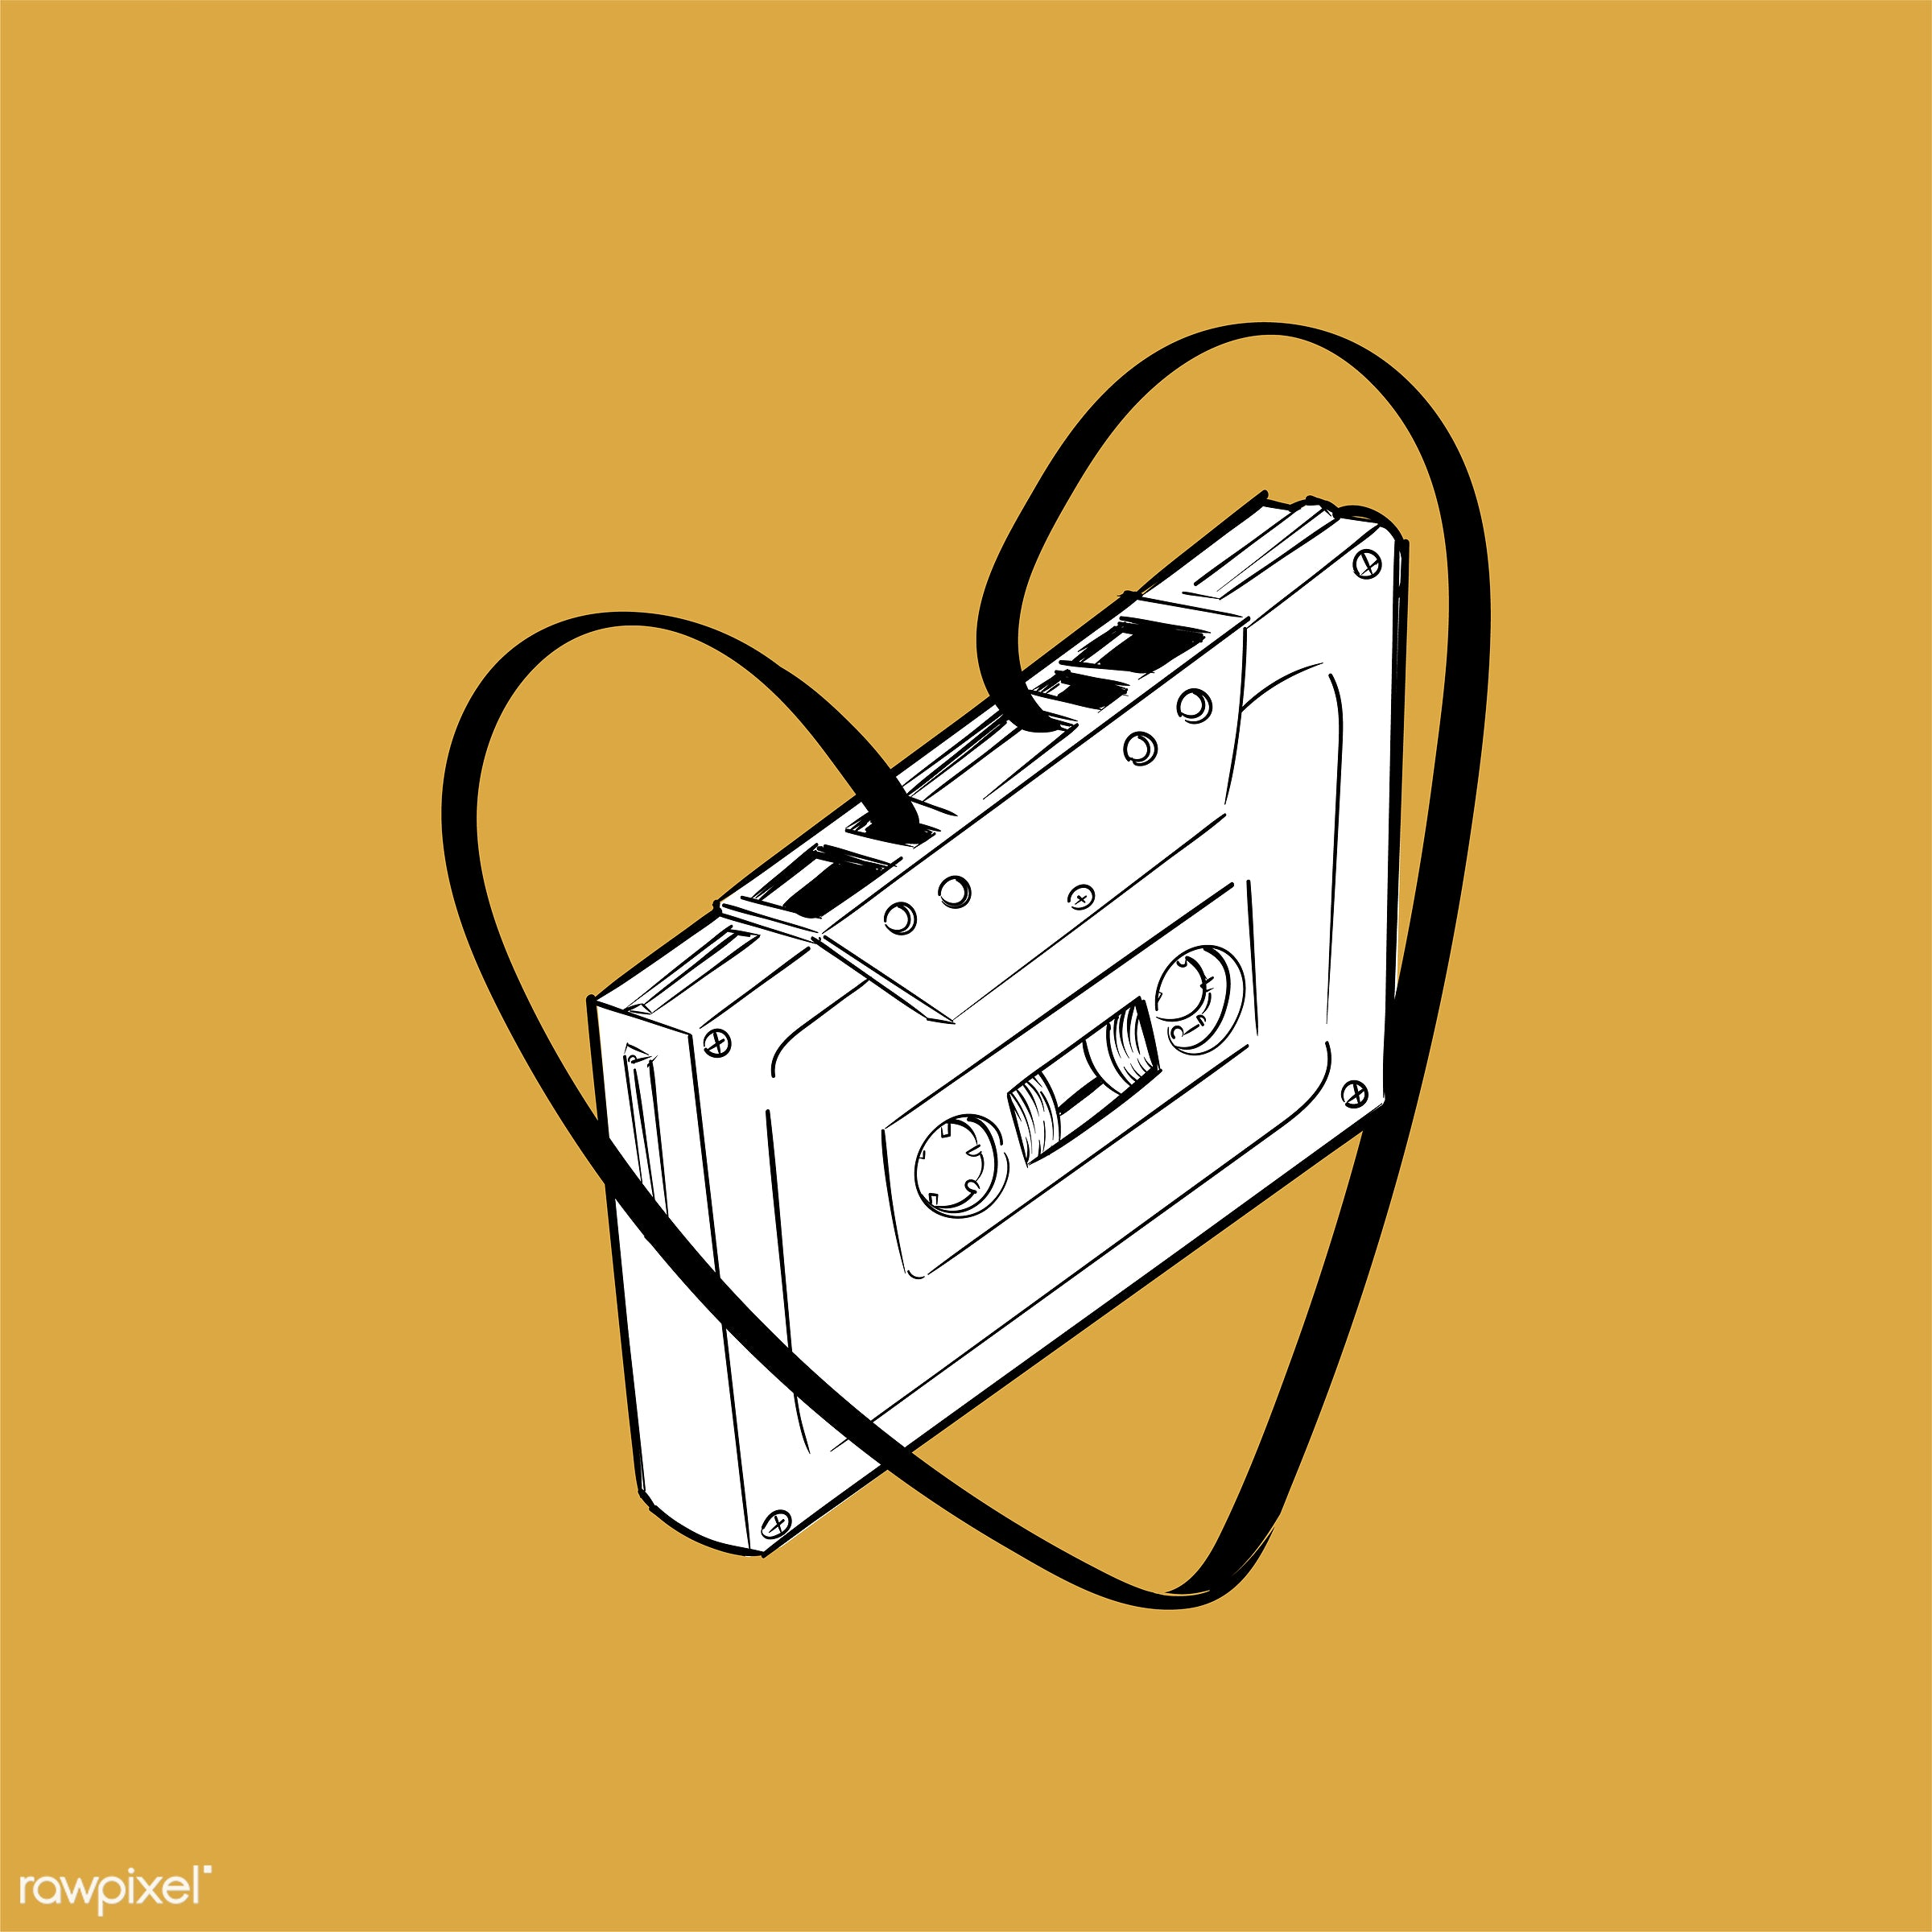 Hand drawing illustration of music entertainment concept - art, artwork, cassette, creative, creativity, design, draw,...